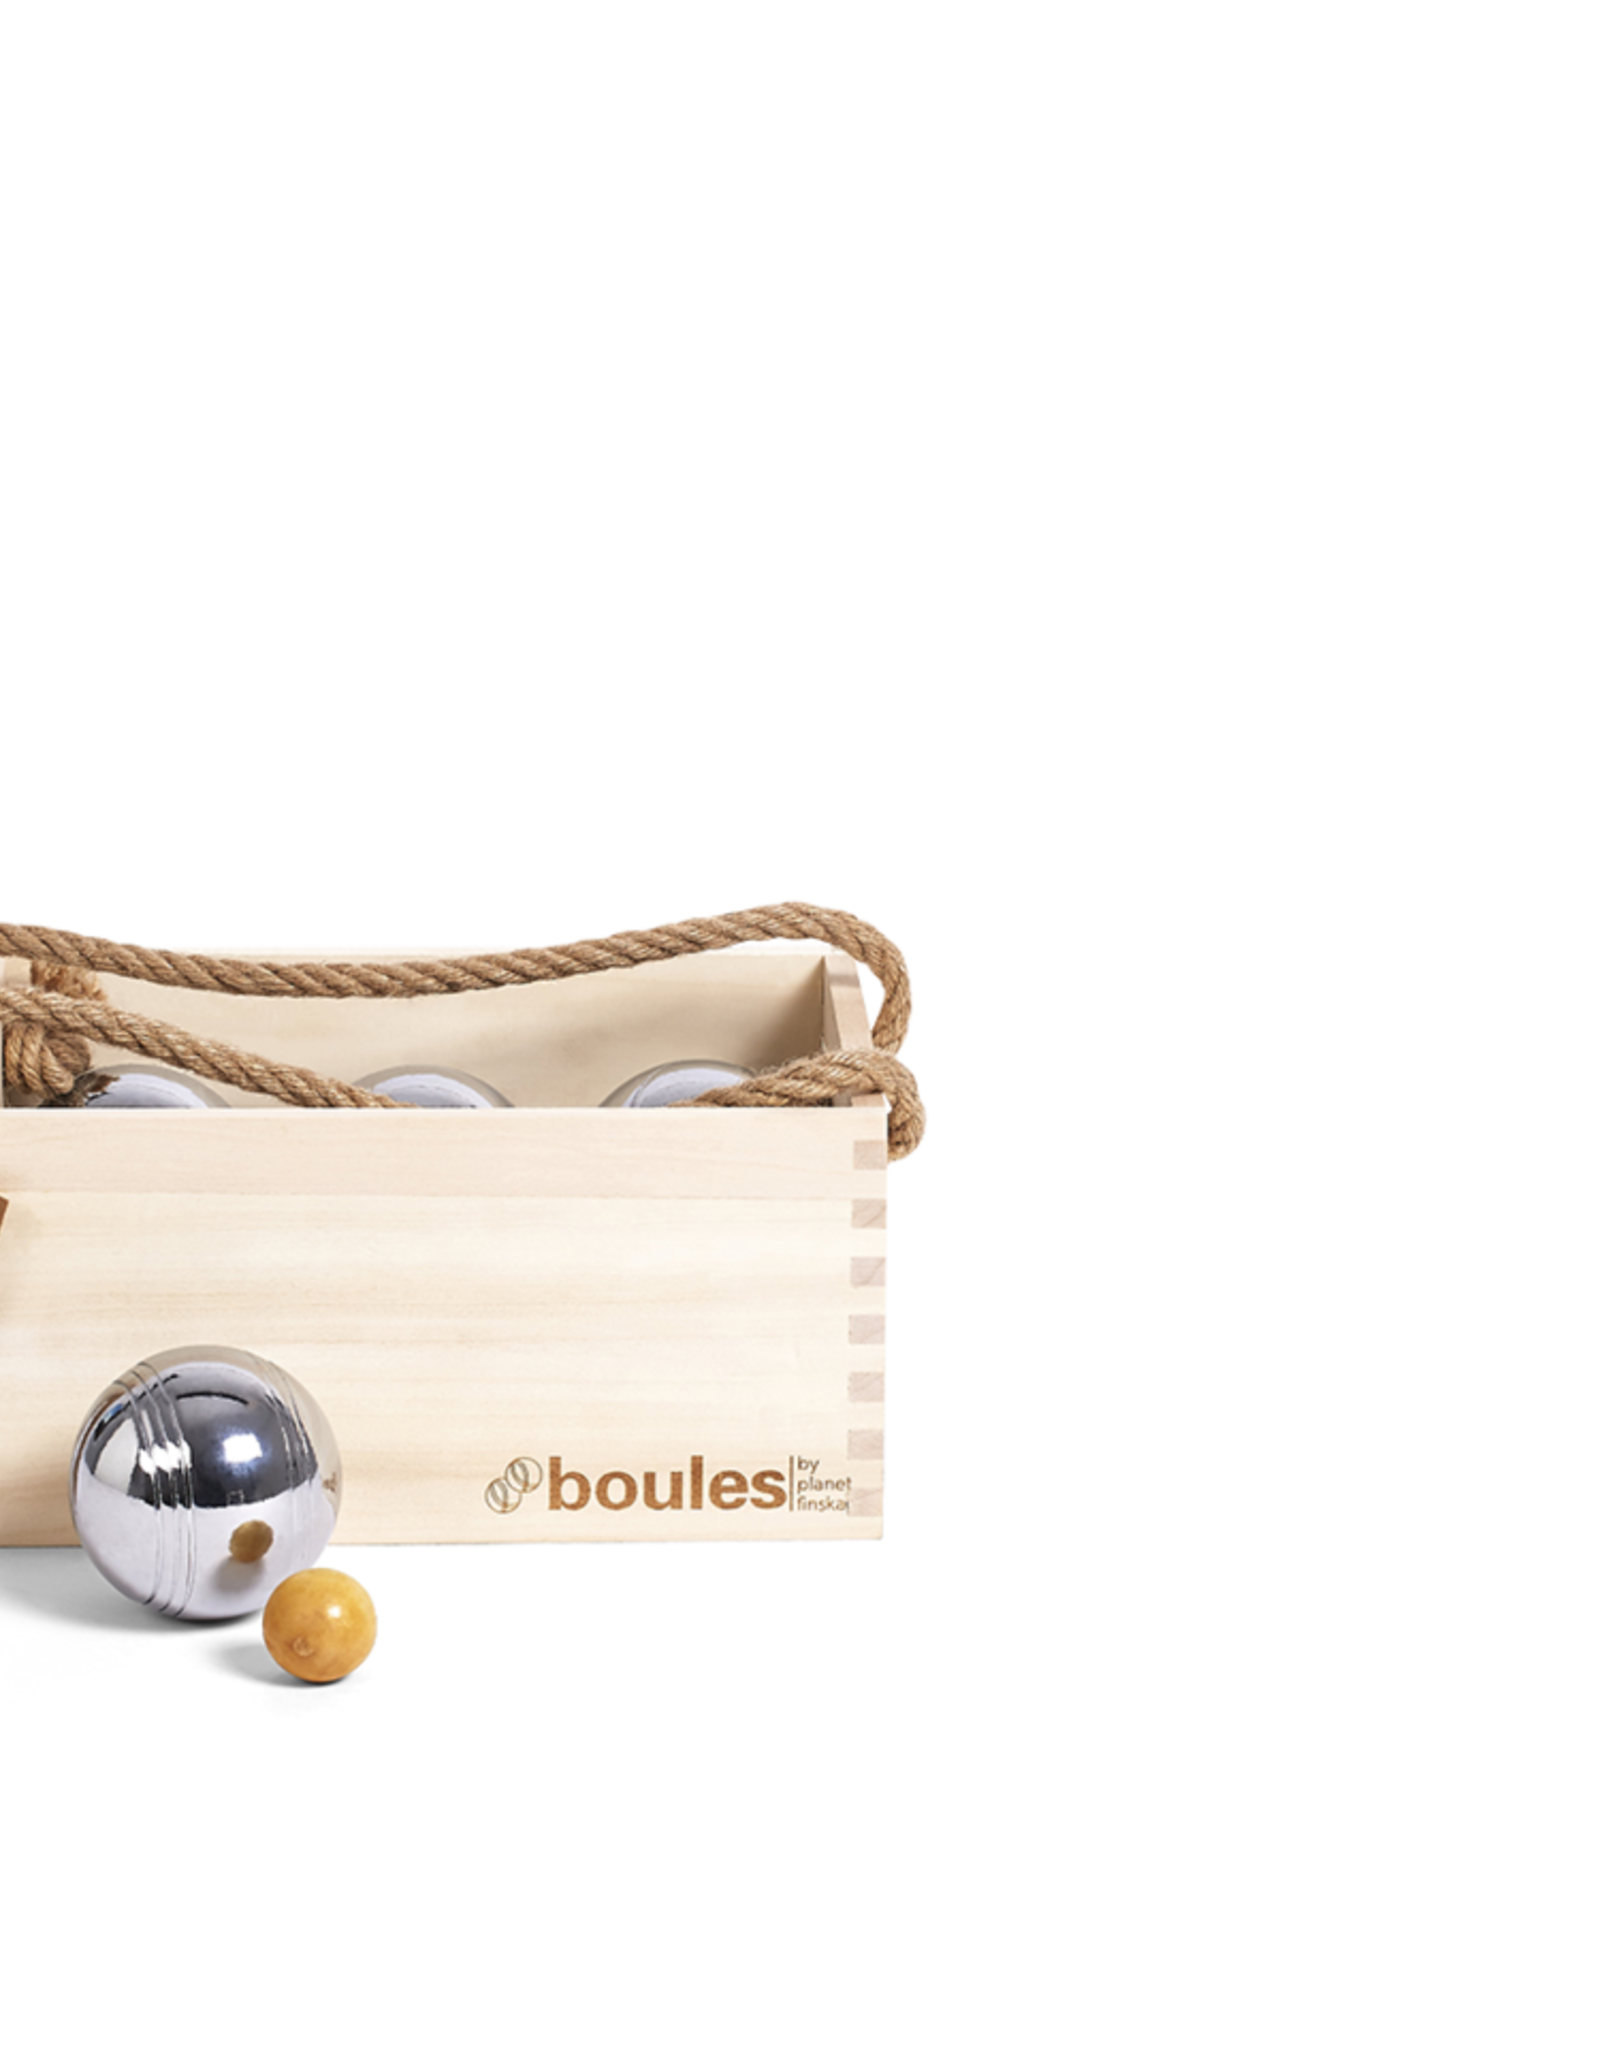 Premium Boules in carry crate